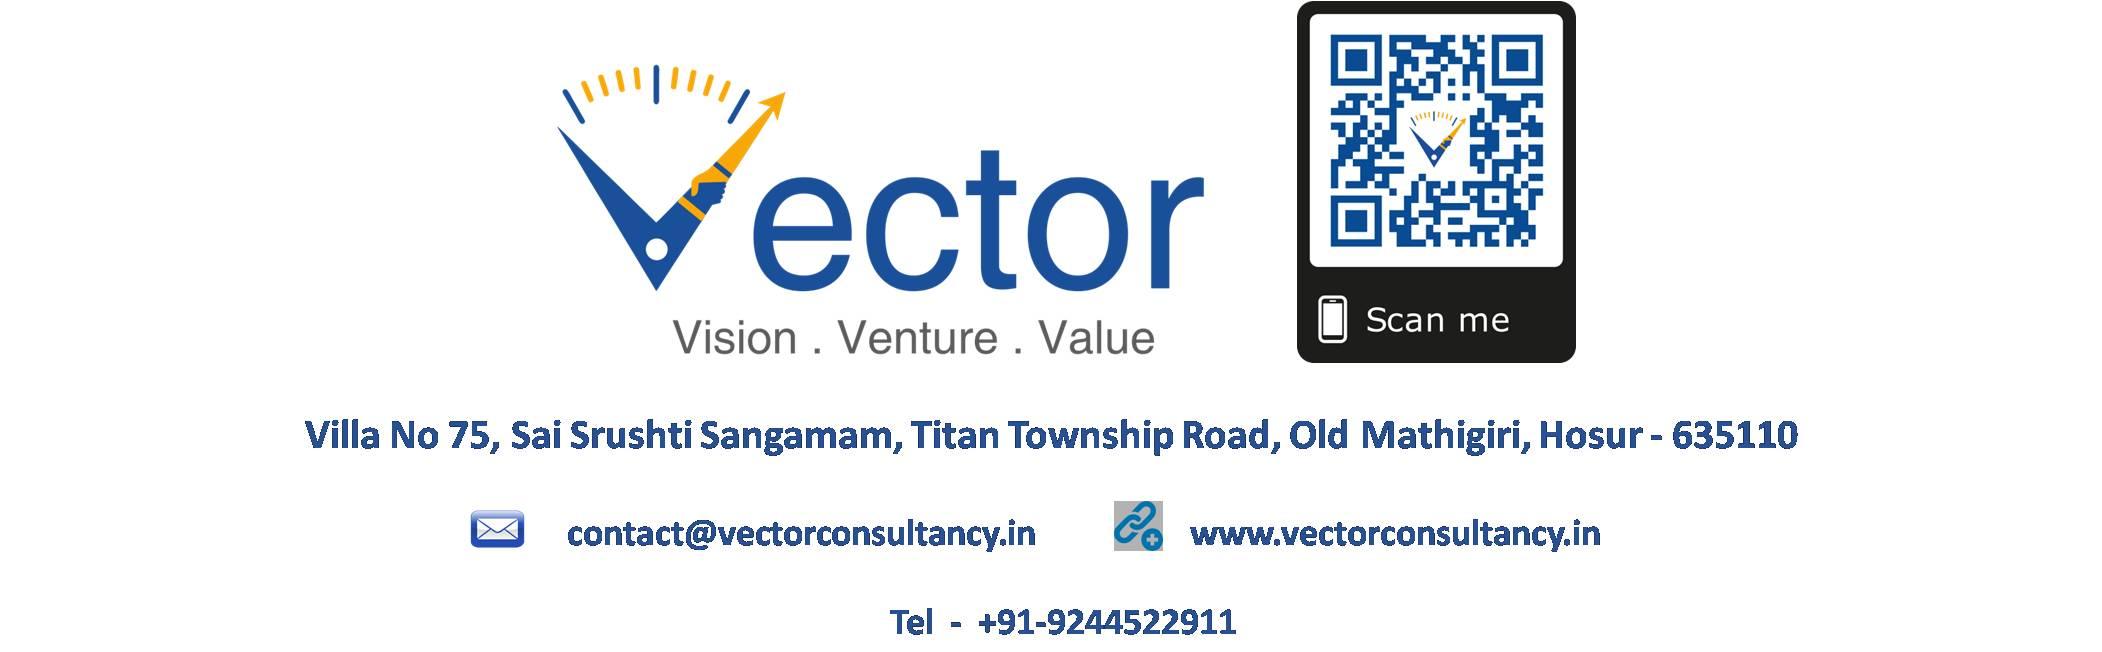 Vector Concultancy Contact